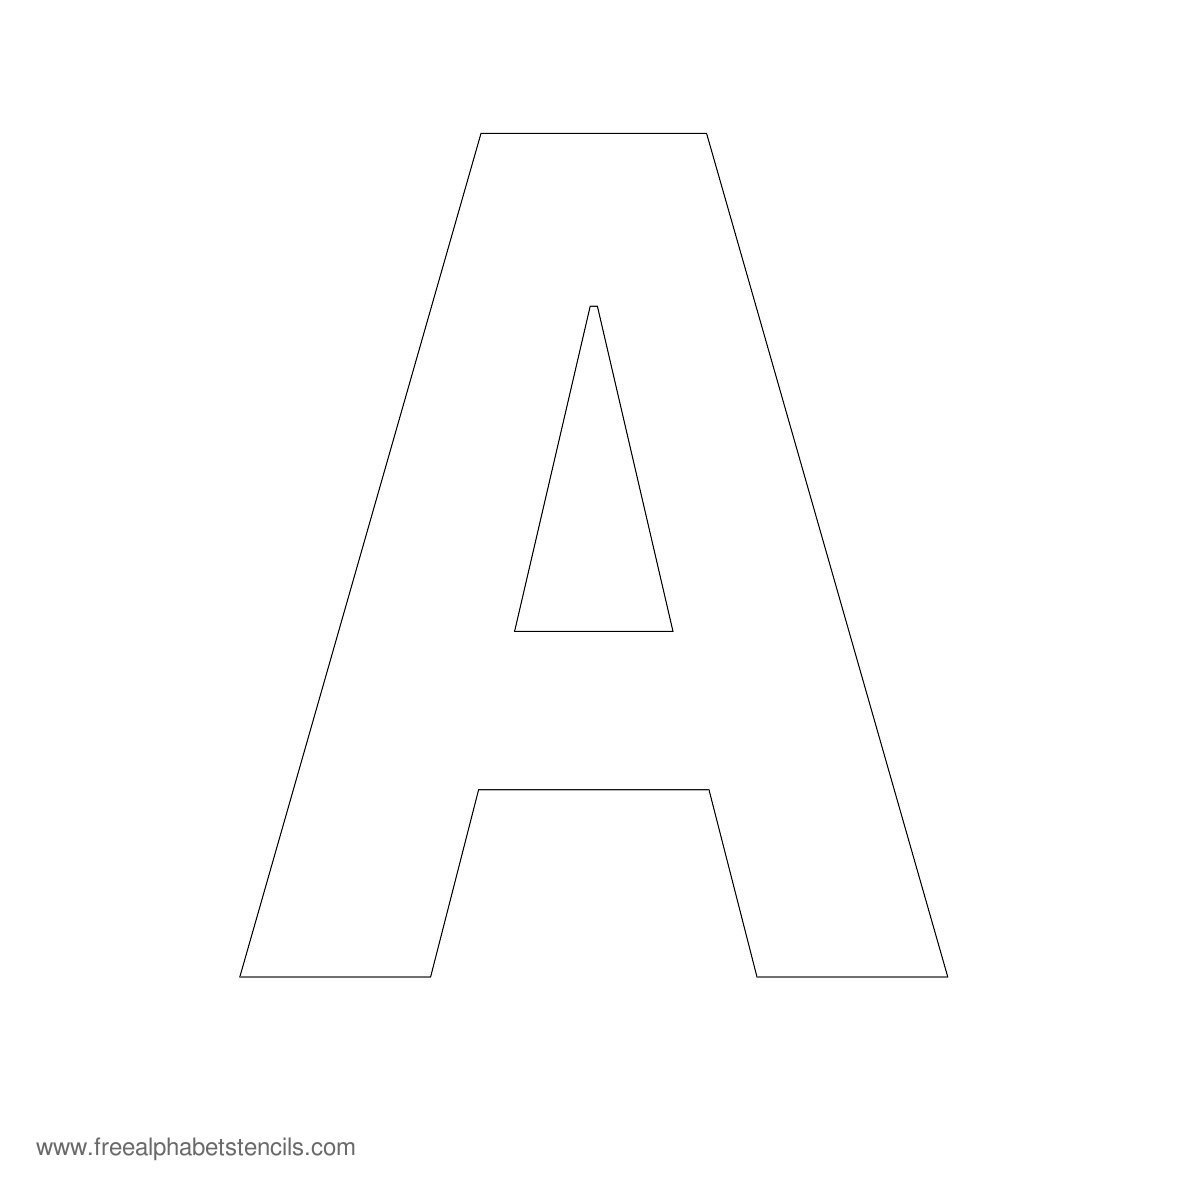 Large Alphabet Stencils | Freealphabetstencils - Free Printable Letter Stencils